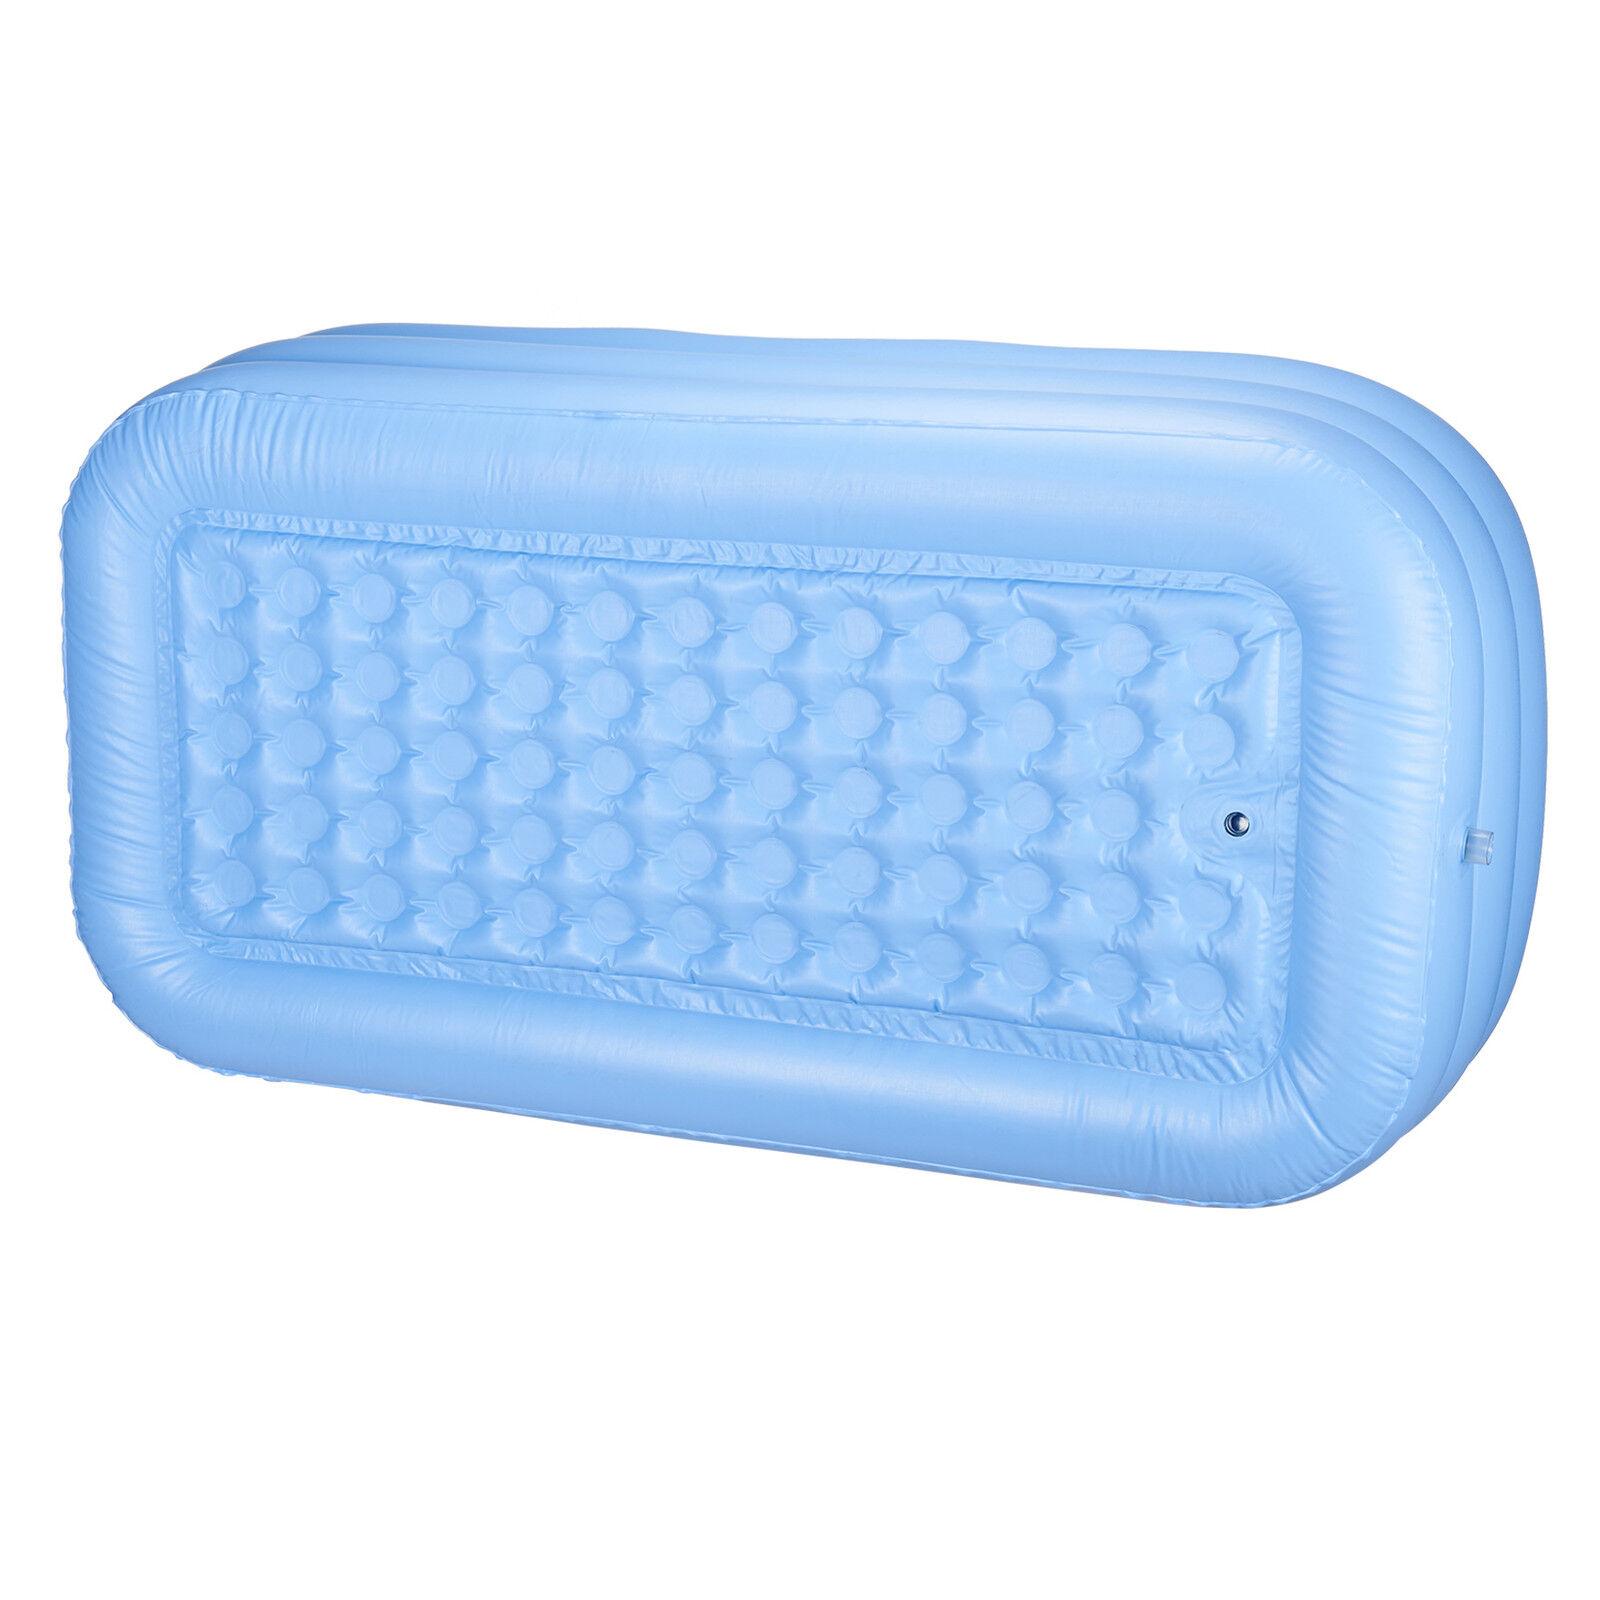 Blow up Adult PVC Folding Portable Foldable Bathtub Inflatable Bath ...